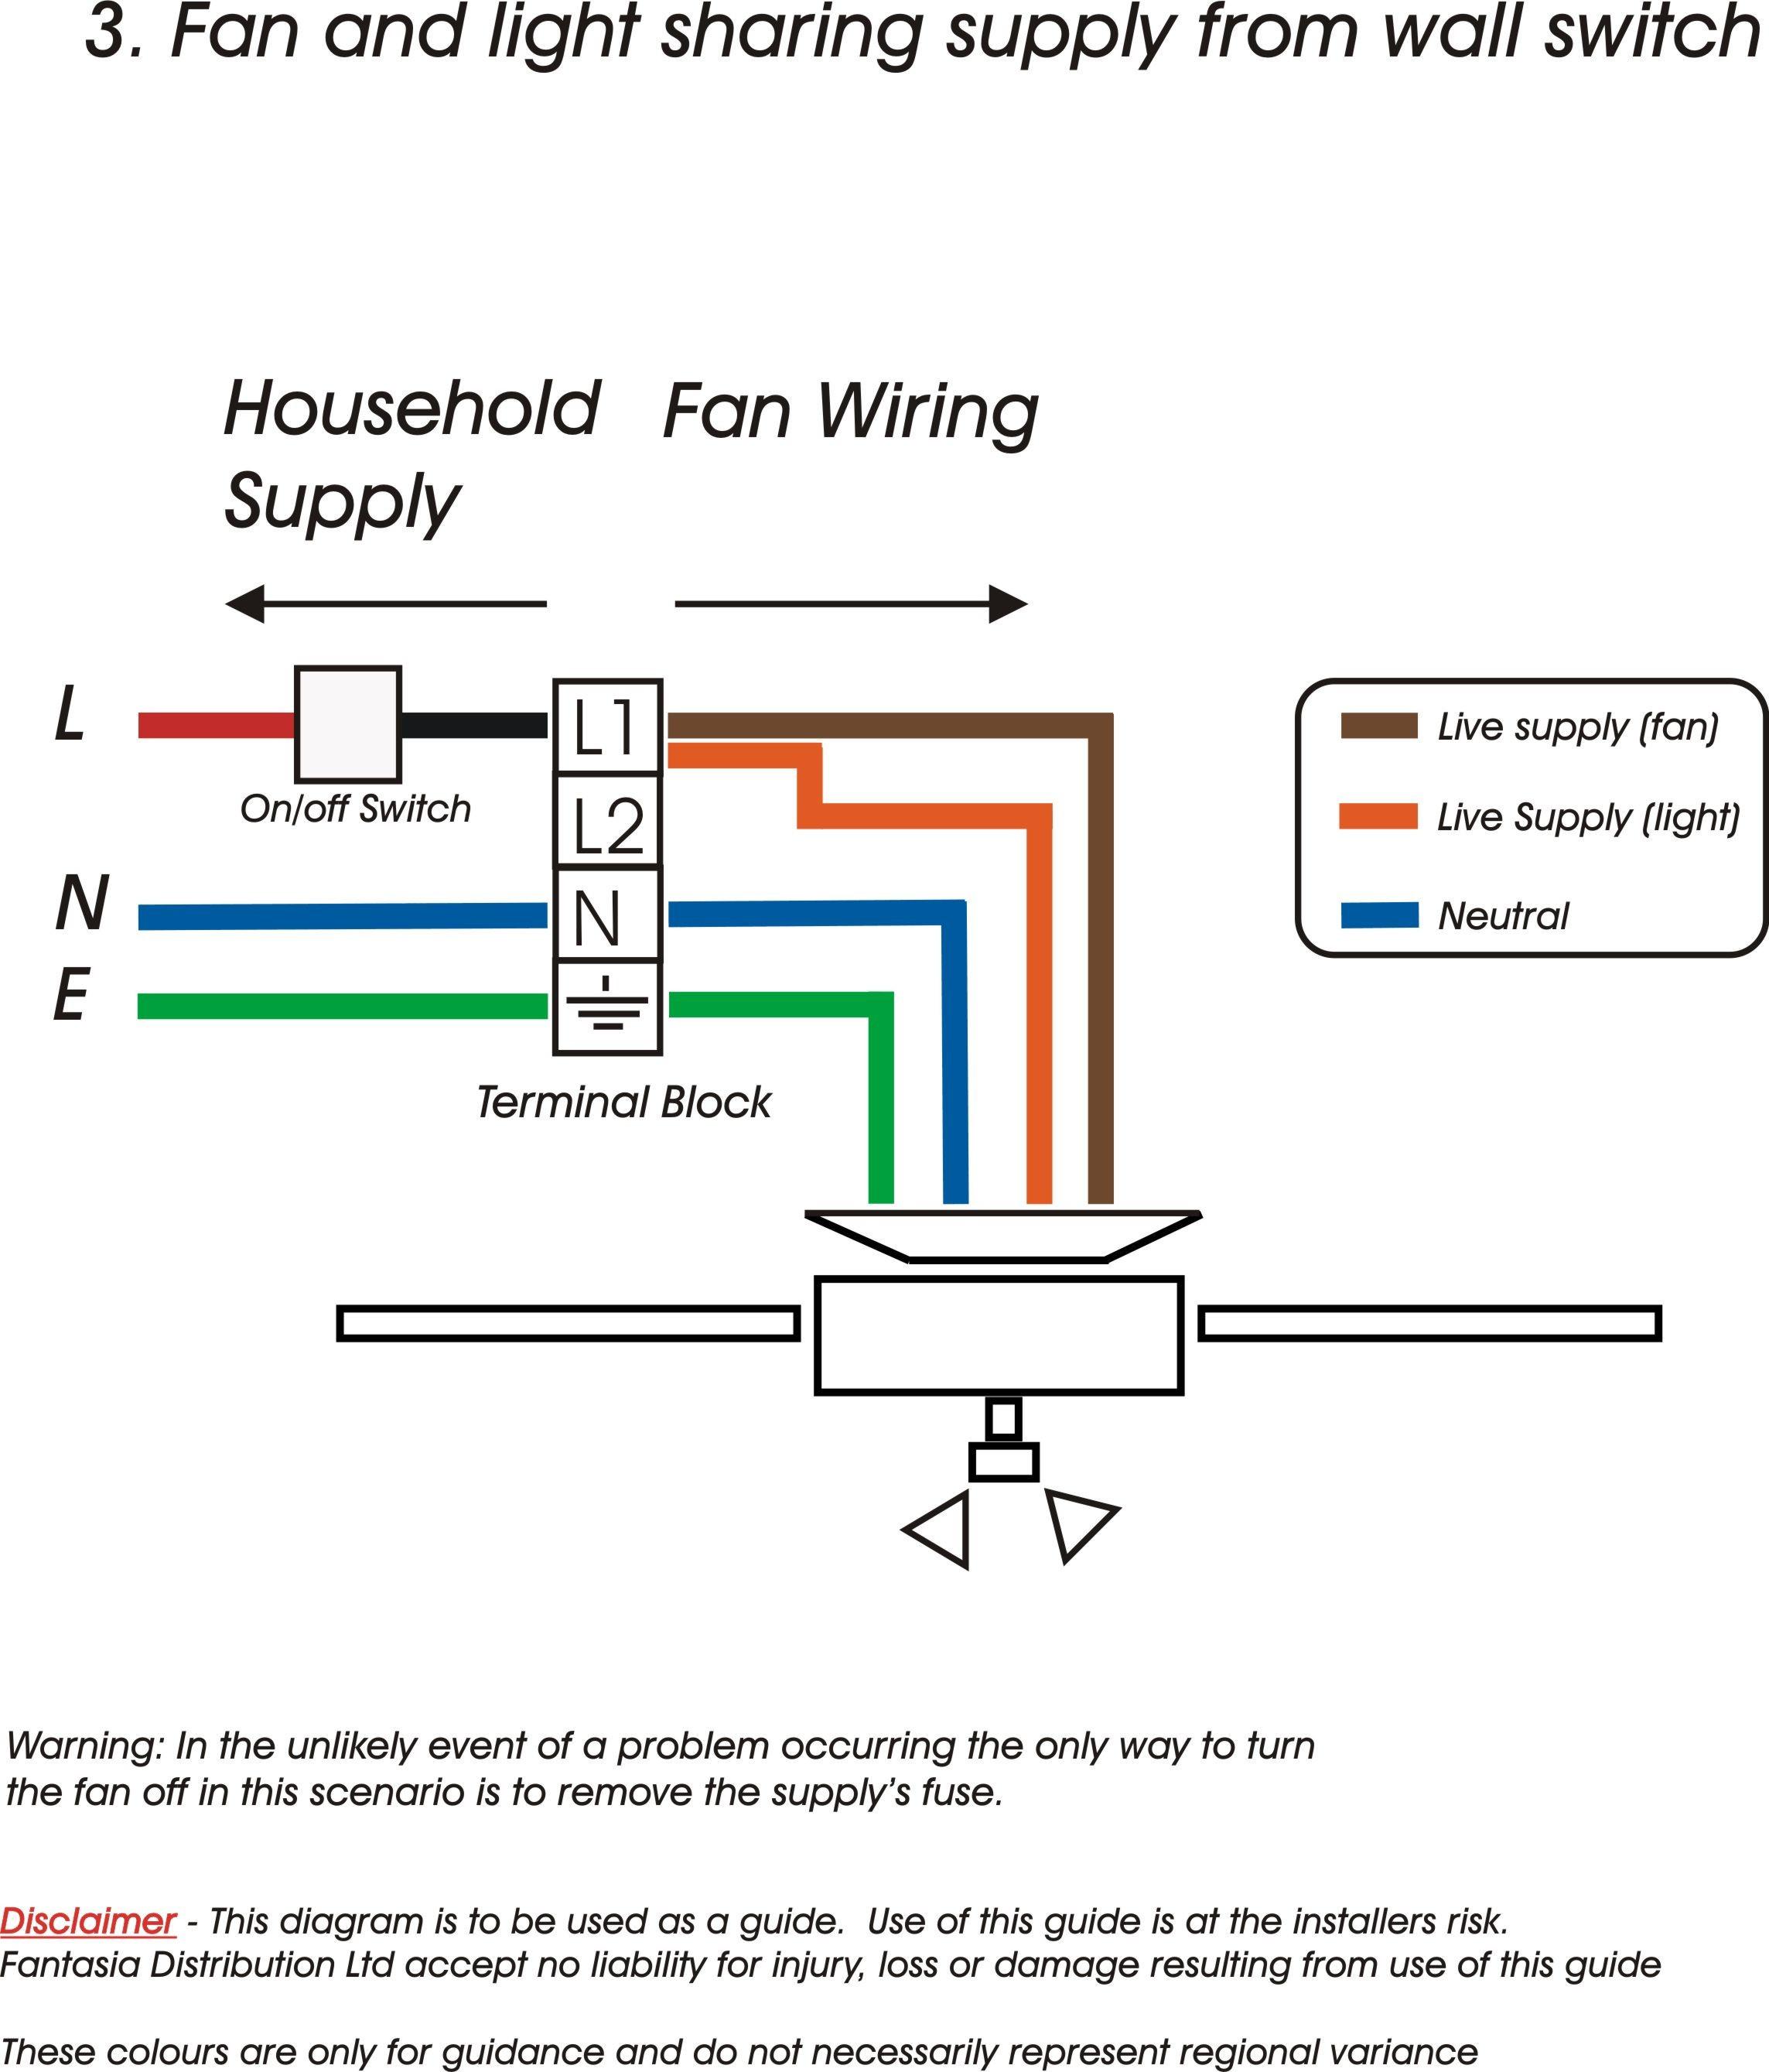 Hampton Bay 3 Speed Ceiling Fan Switch Wiring Diagram Best Of Wiring - Hampton Bay Ceiling Fan Switch Wiring Diagram